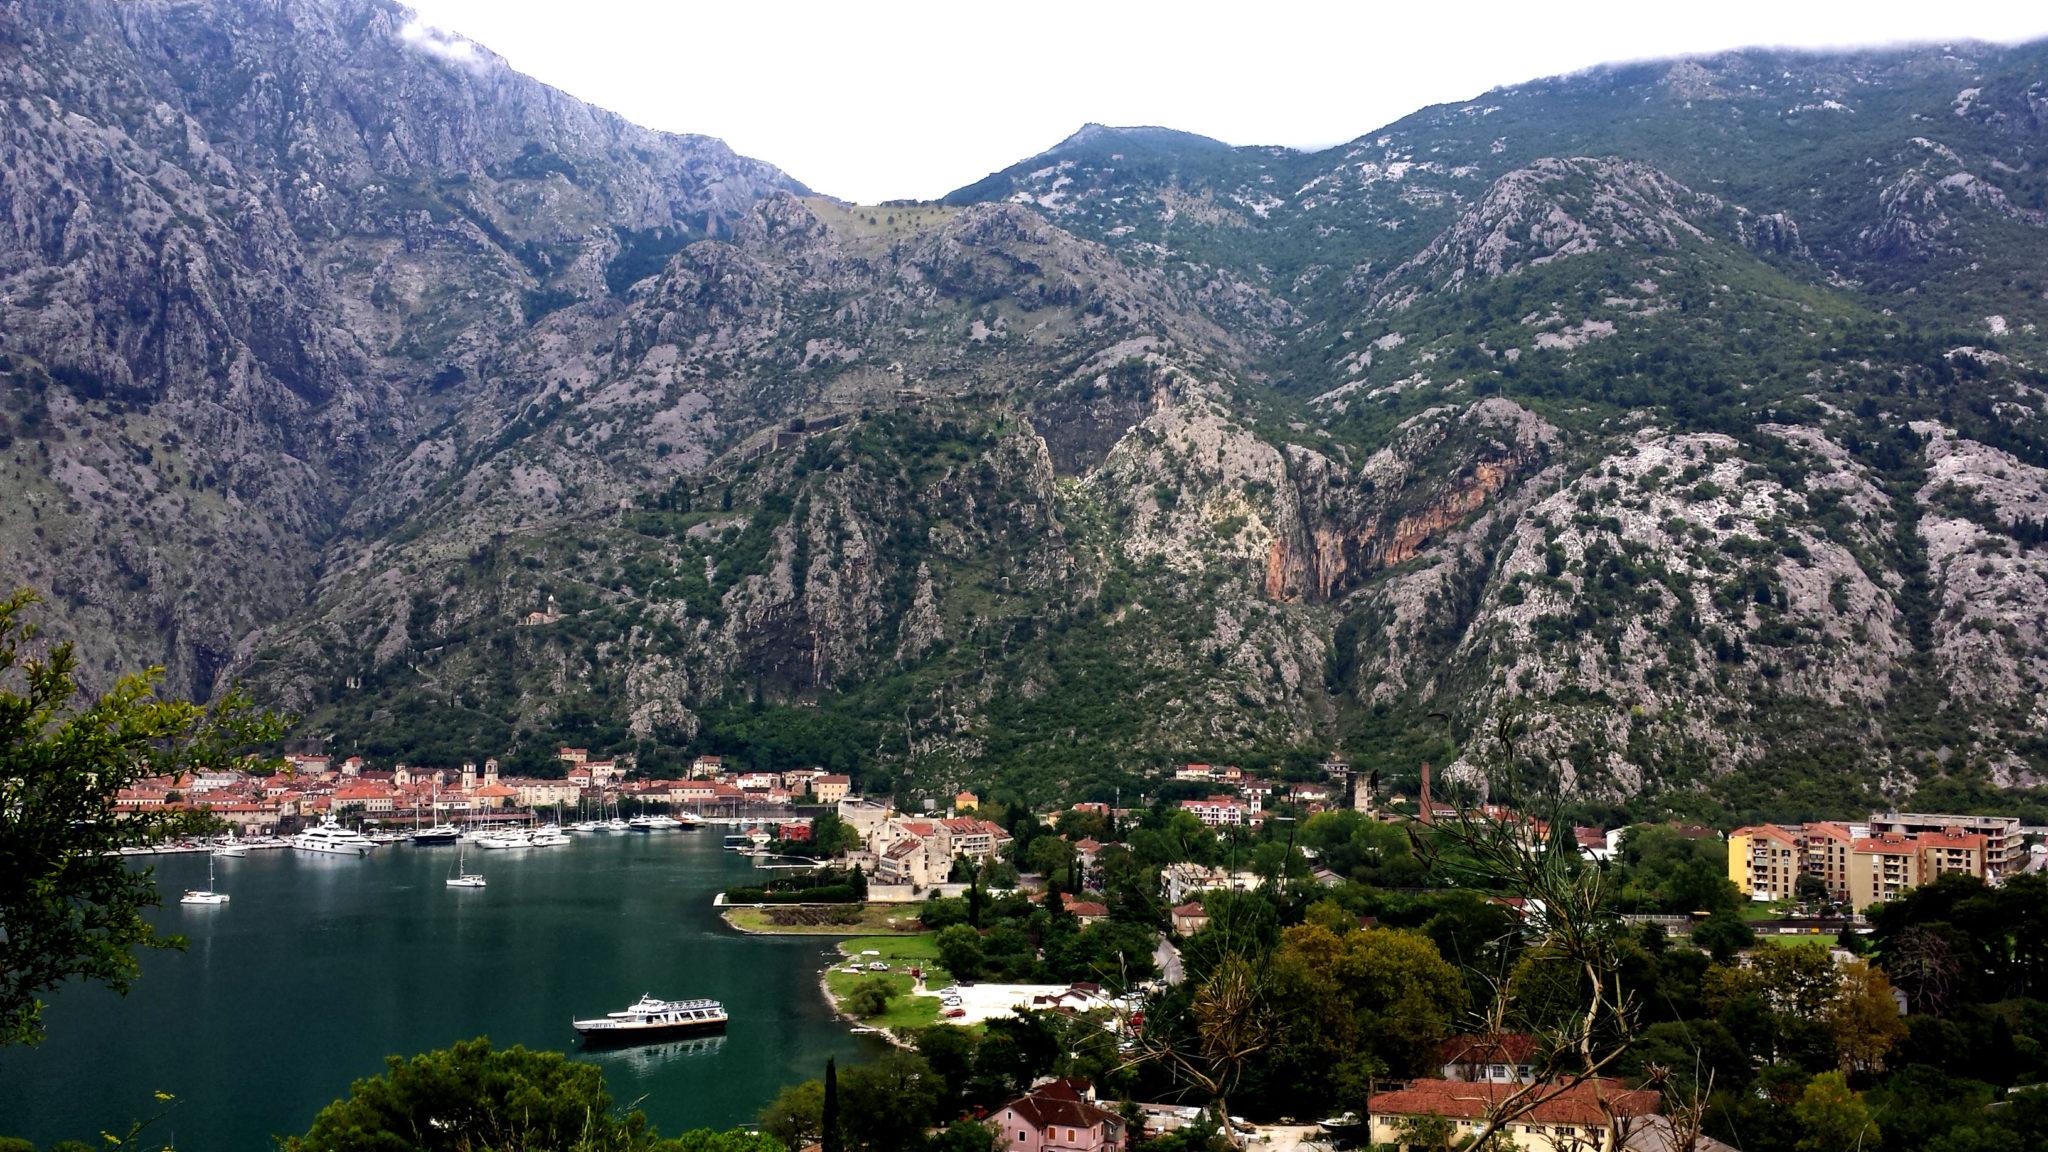 Hema_Le_parc_Lovcen_blog_voyage_travel_kotor_serpentine1